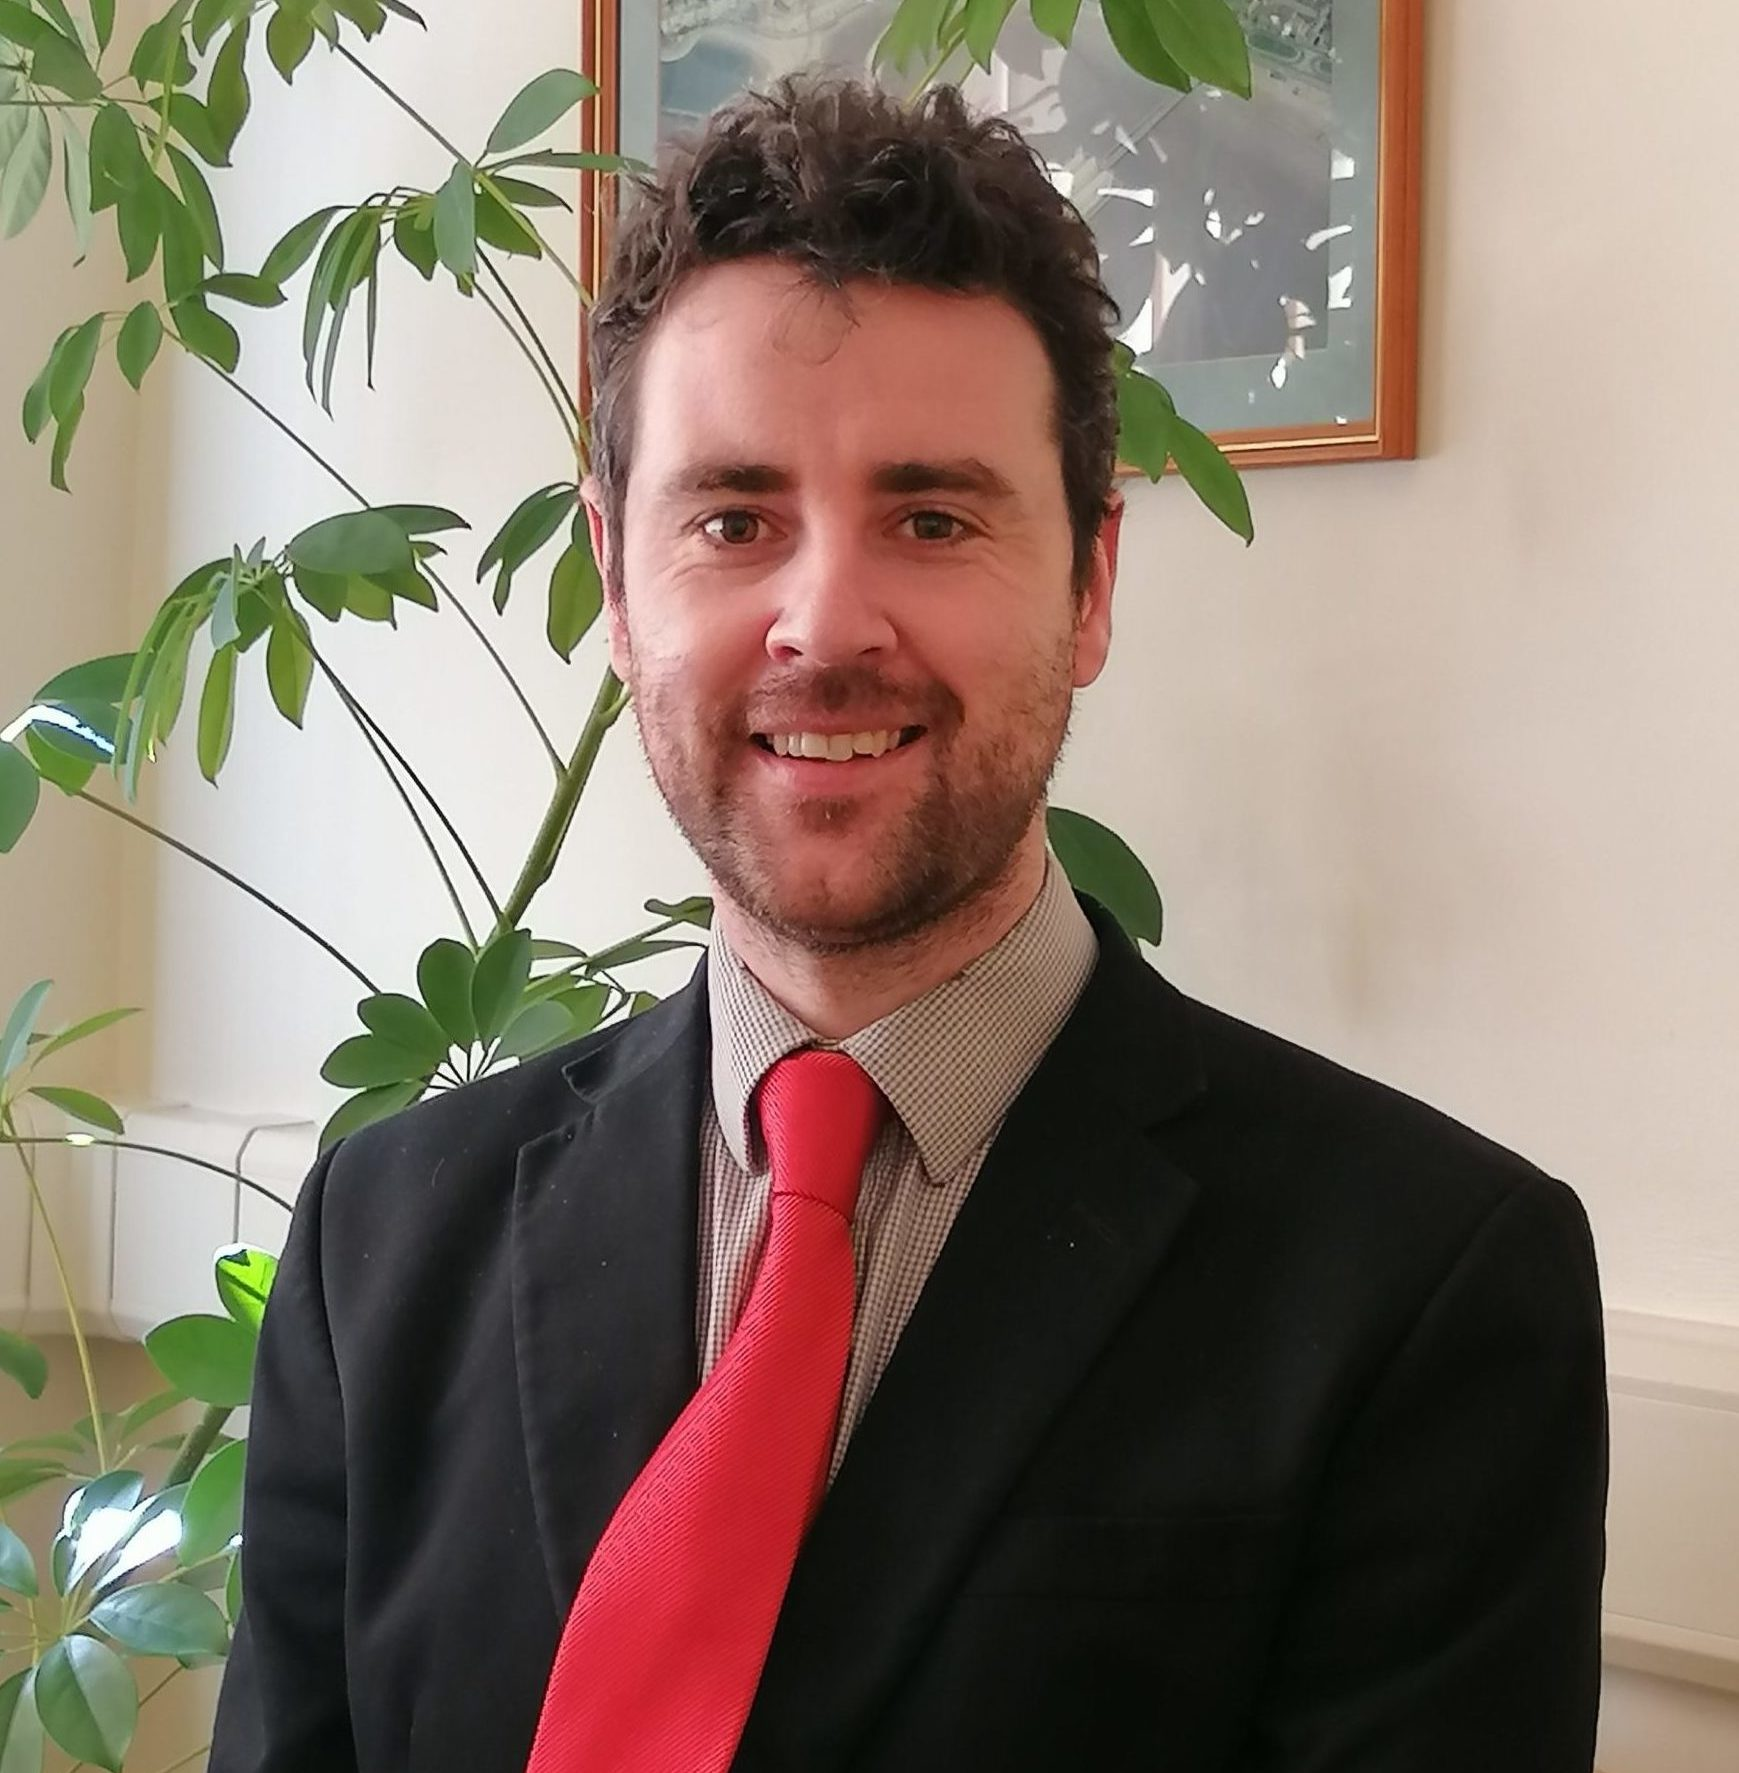 Jon Berridge